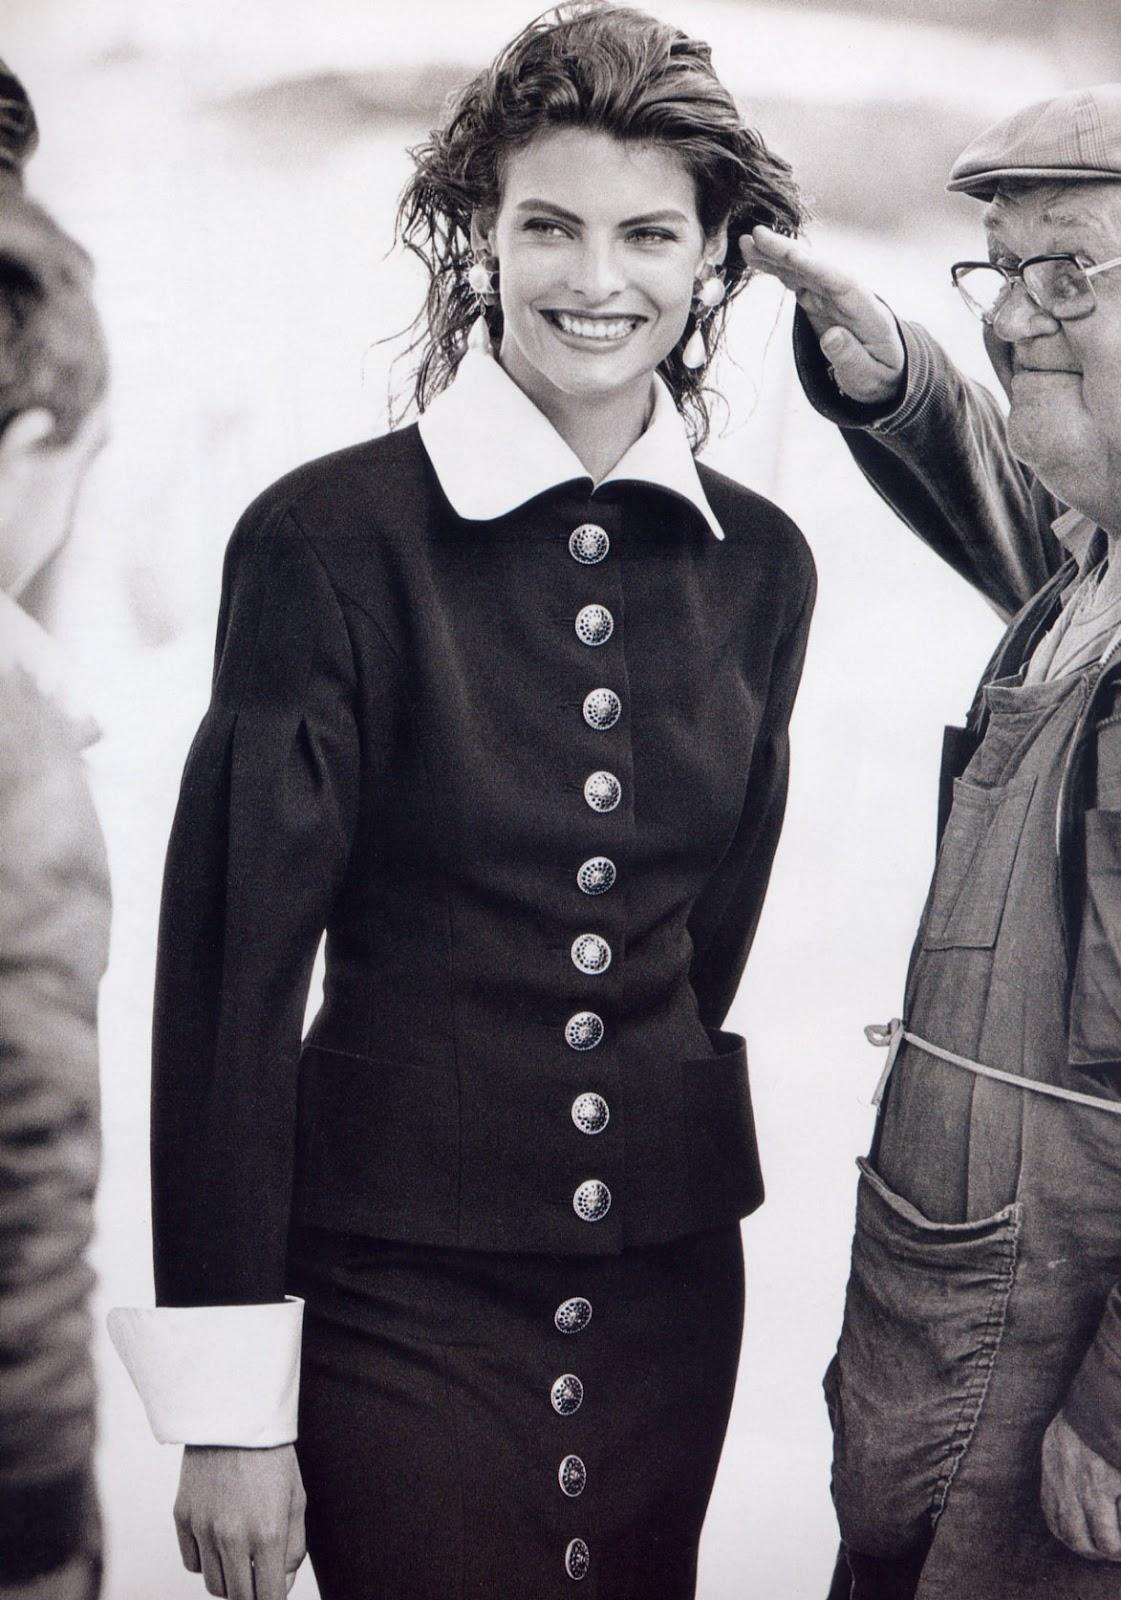 http://4.bp.blogspot.com/-UoVrJ_sYG7Q/T1jwqmeJETI/AAAAAAAAEAY/_CoKoBw_9DY/s1600/Linda+Evangelista+1988+09+Vogue+Paris+Ph+Unk+02.jpg